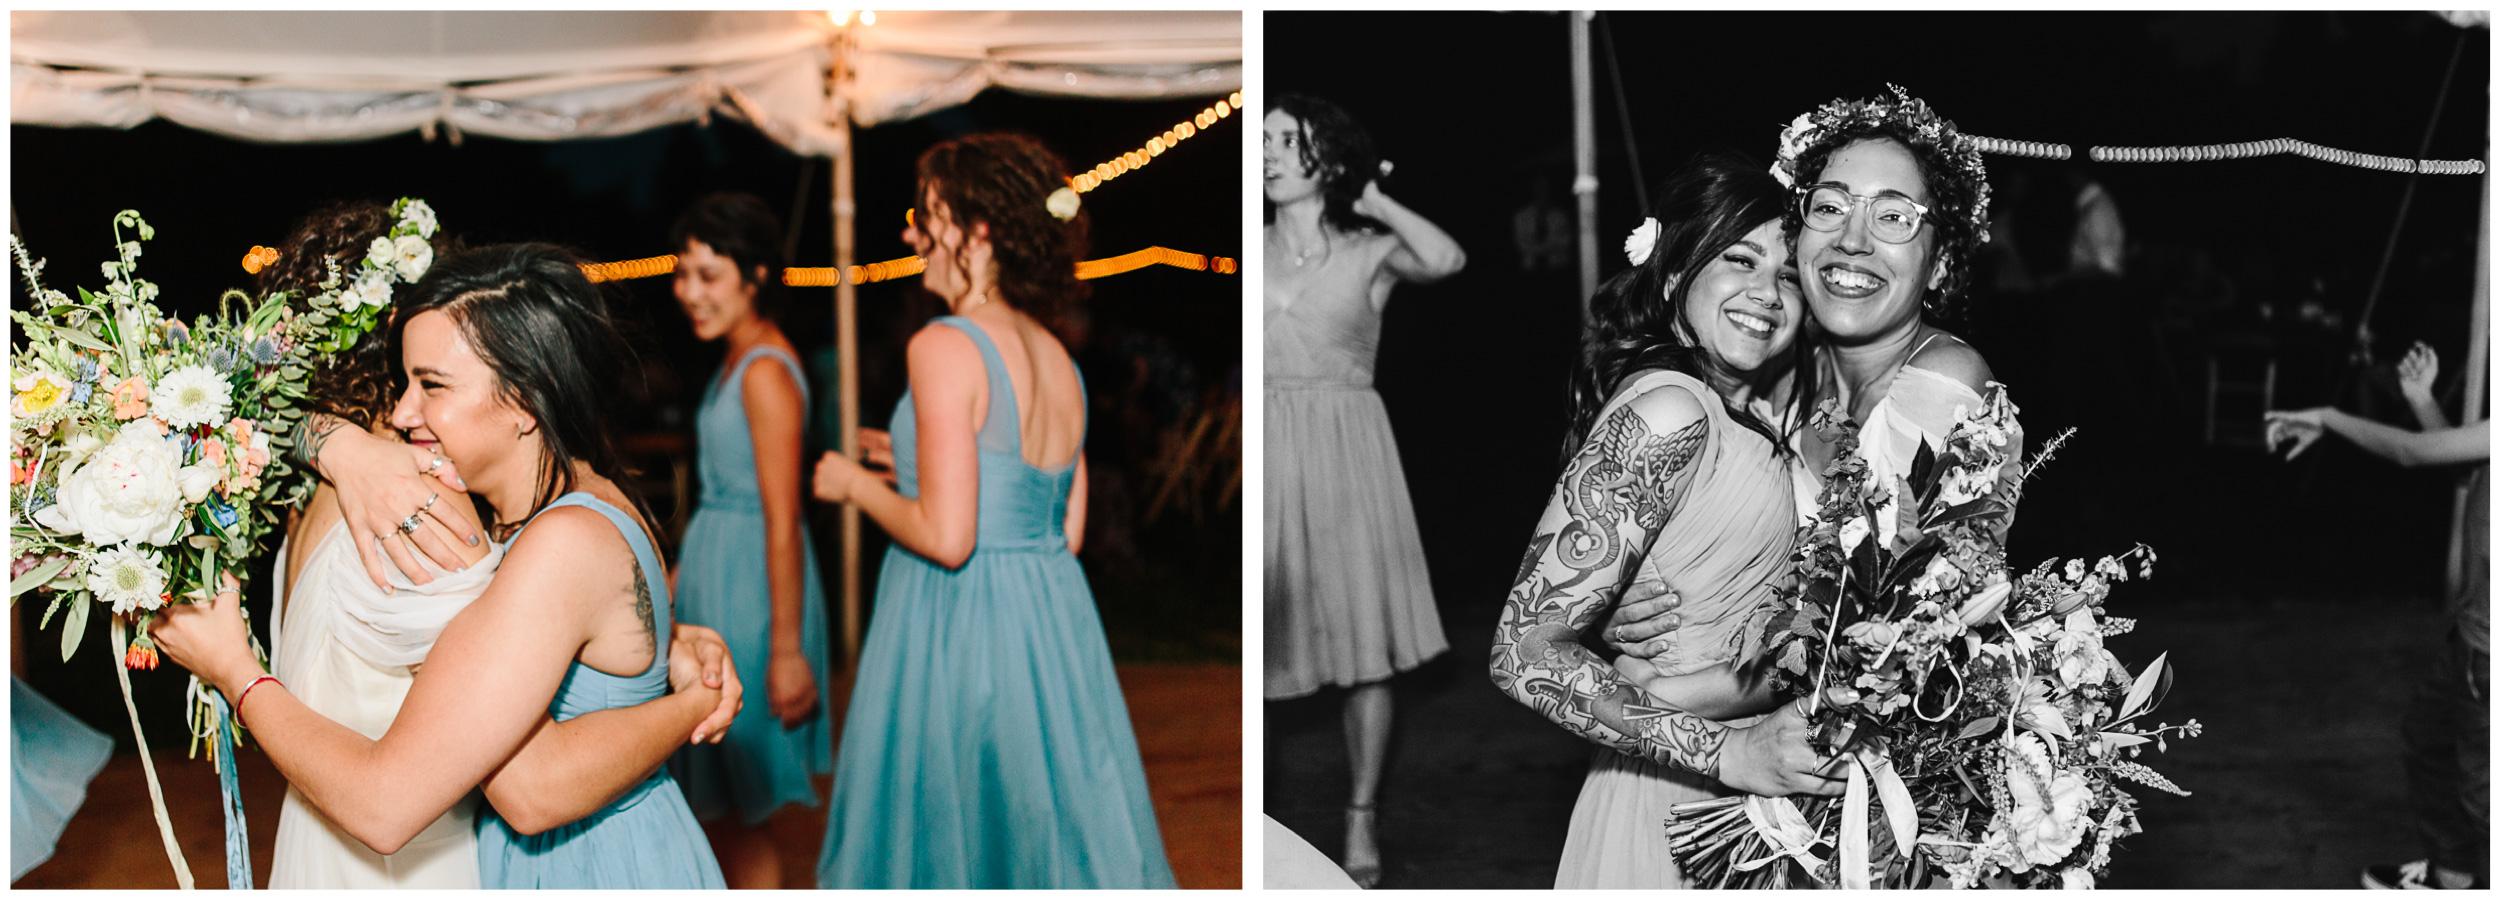 lyons_colorado_wedding_82.jpg